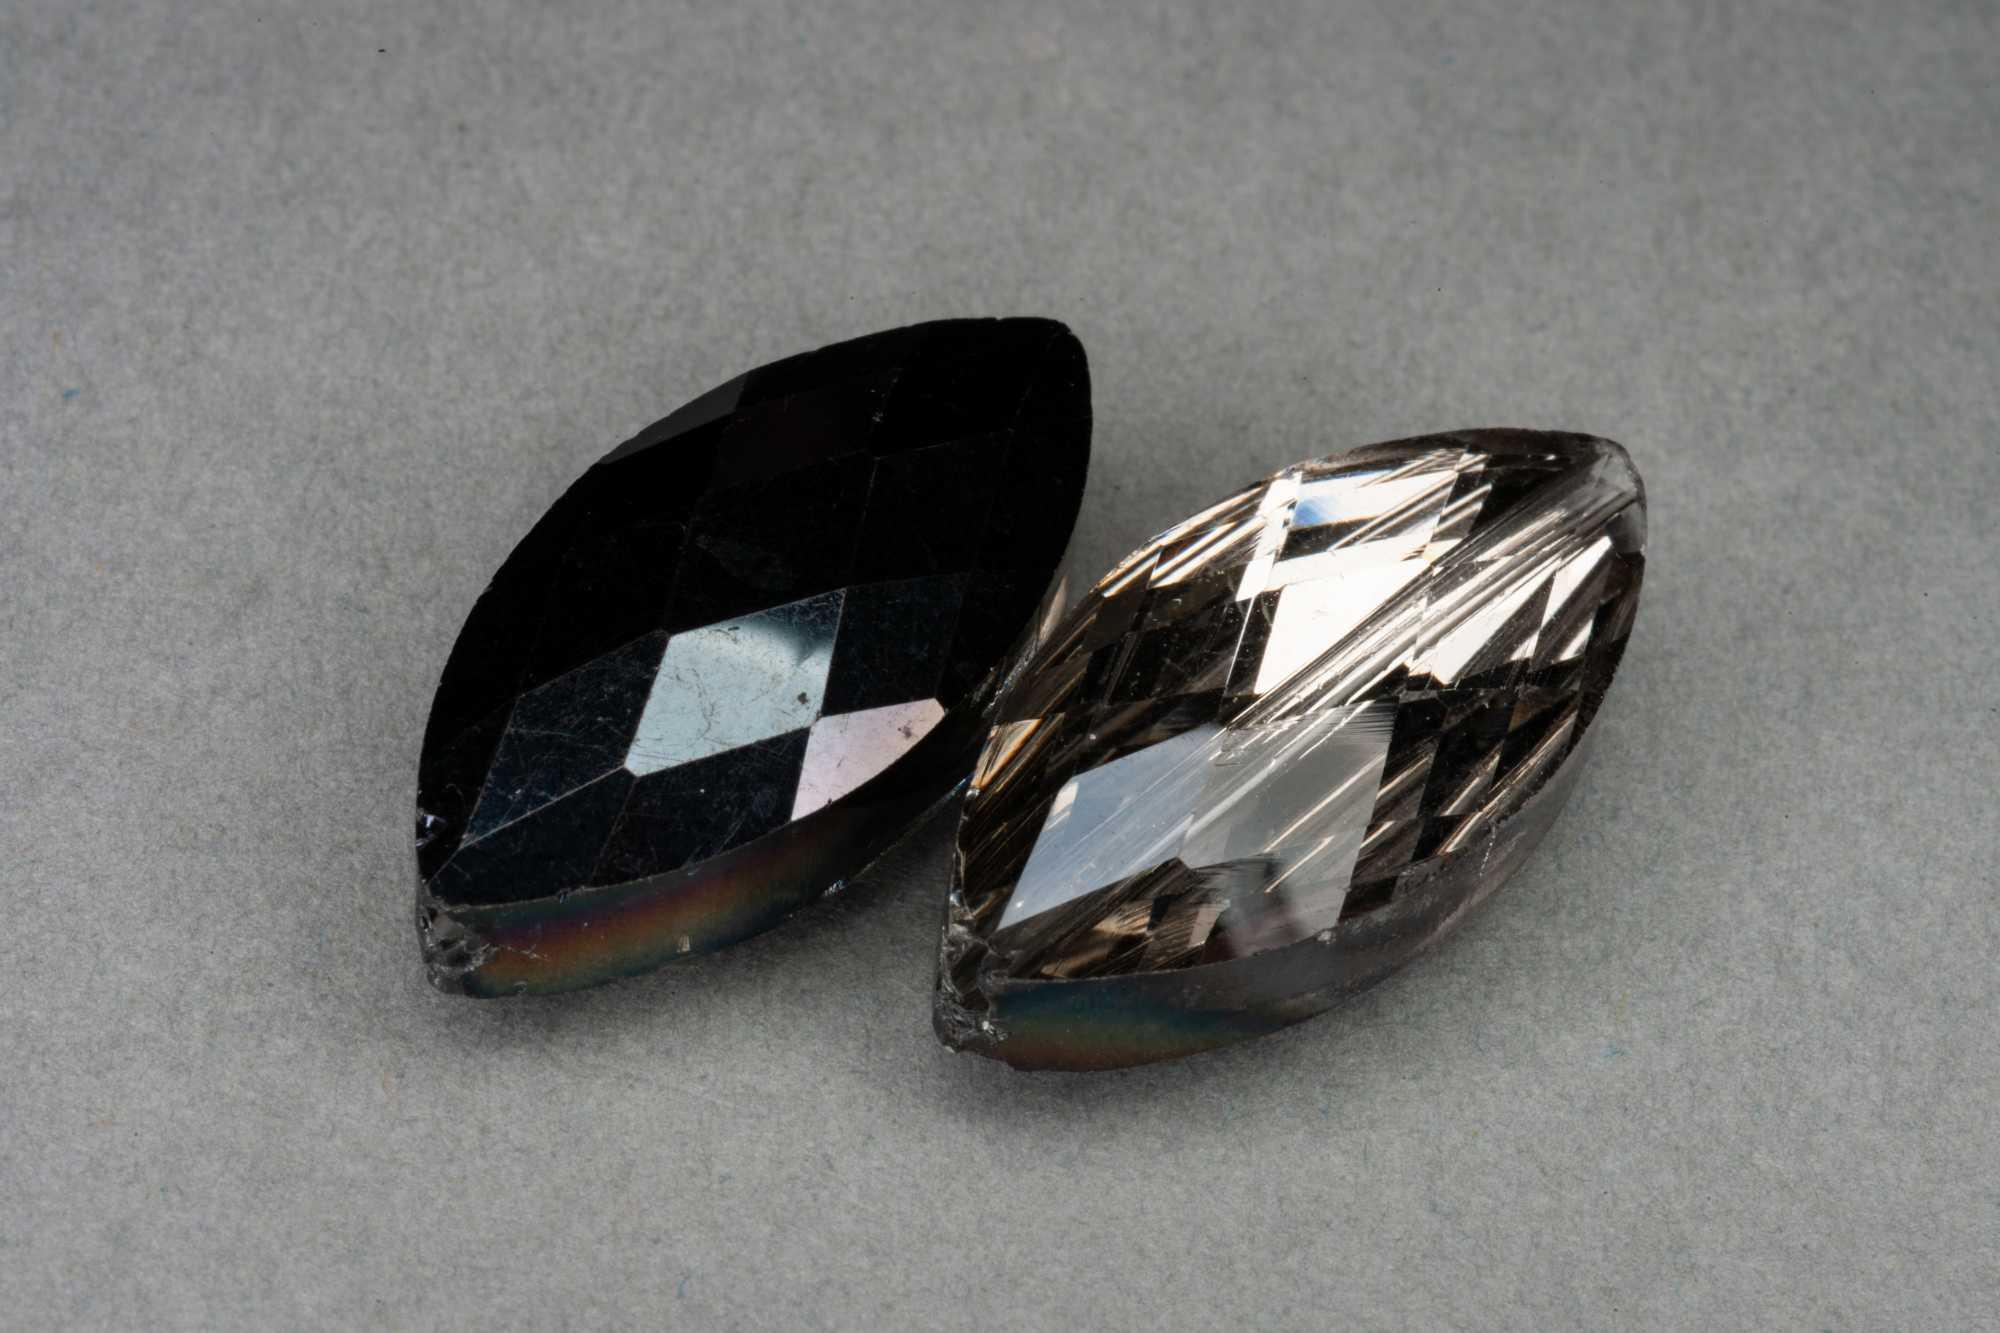 Metallic Black/Silver Lens Shape Faceted Glass Bead 25x12x7mm